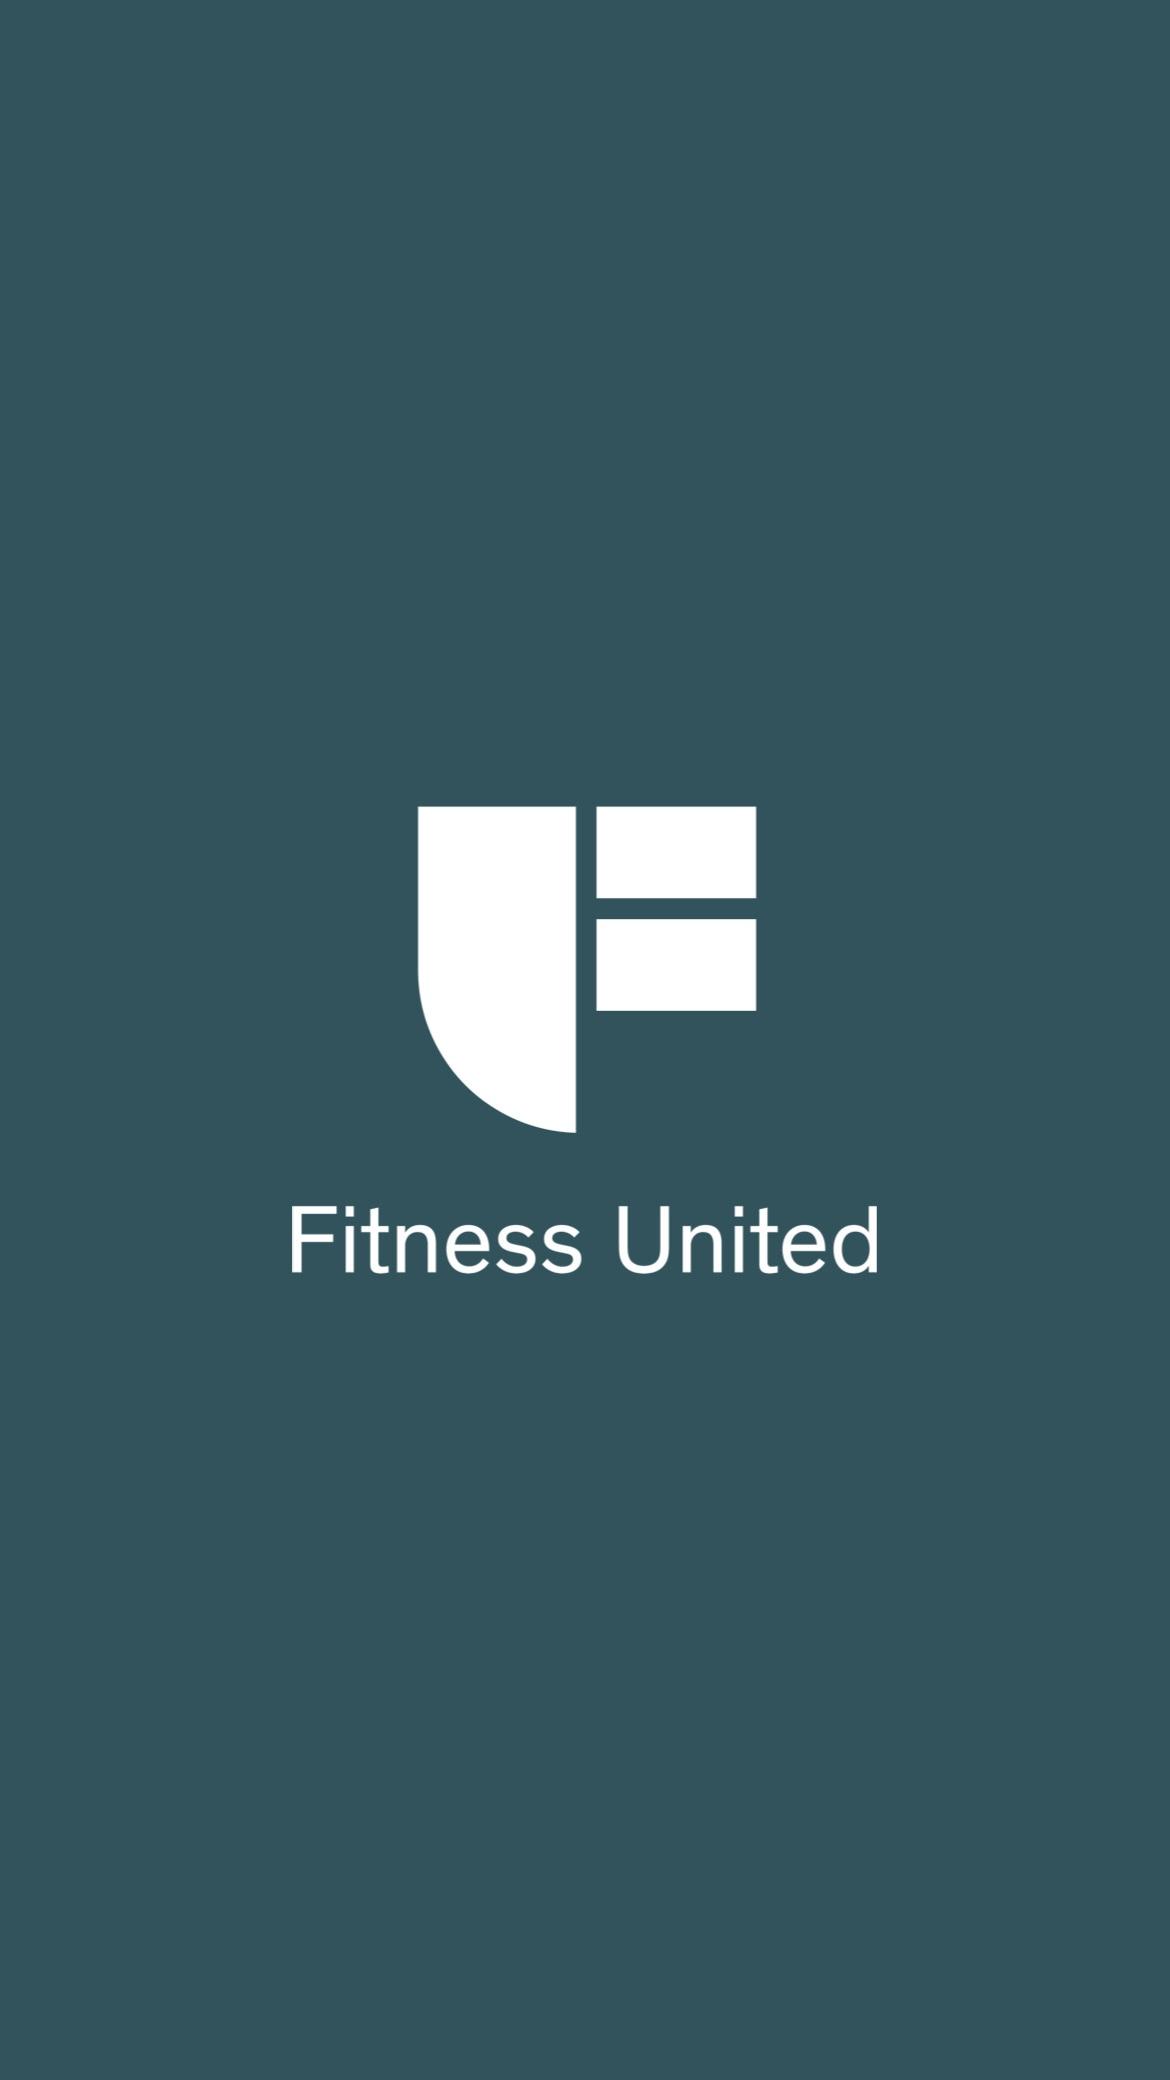 Fitness United